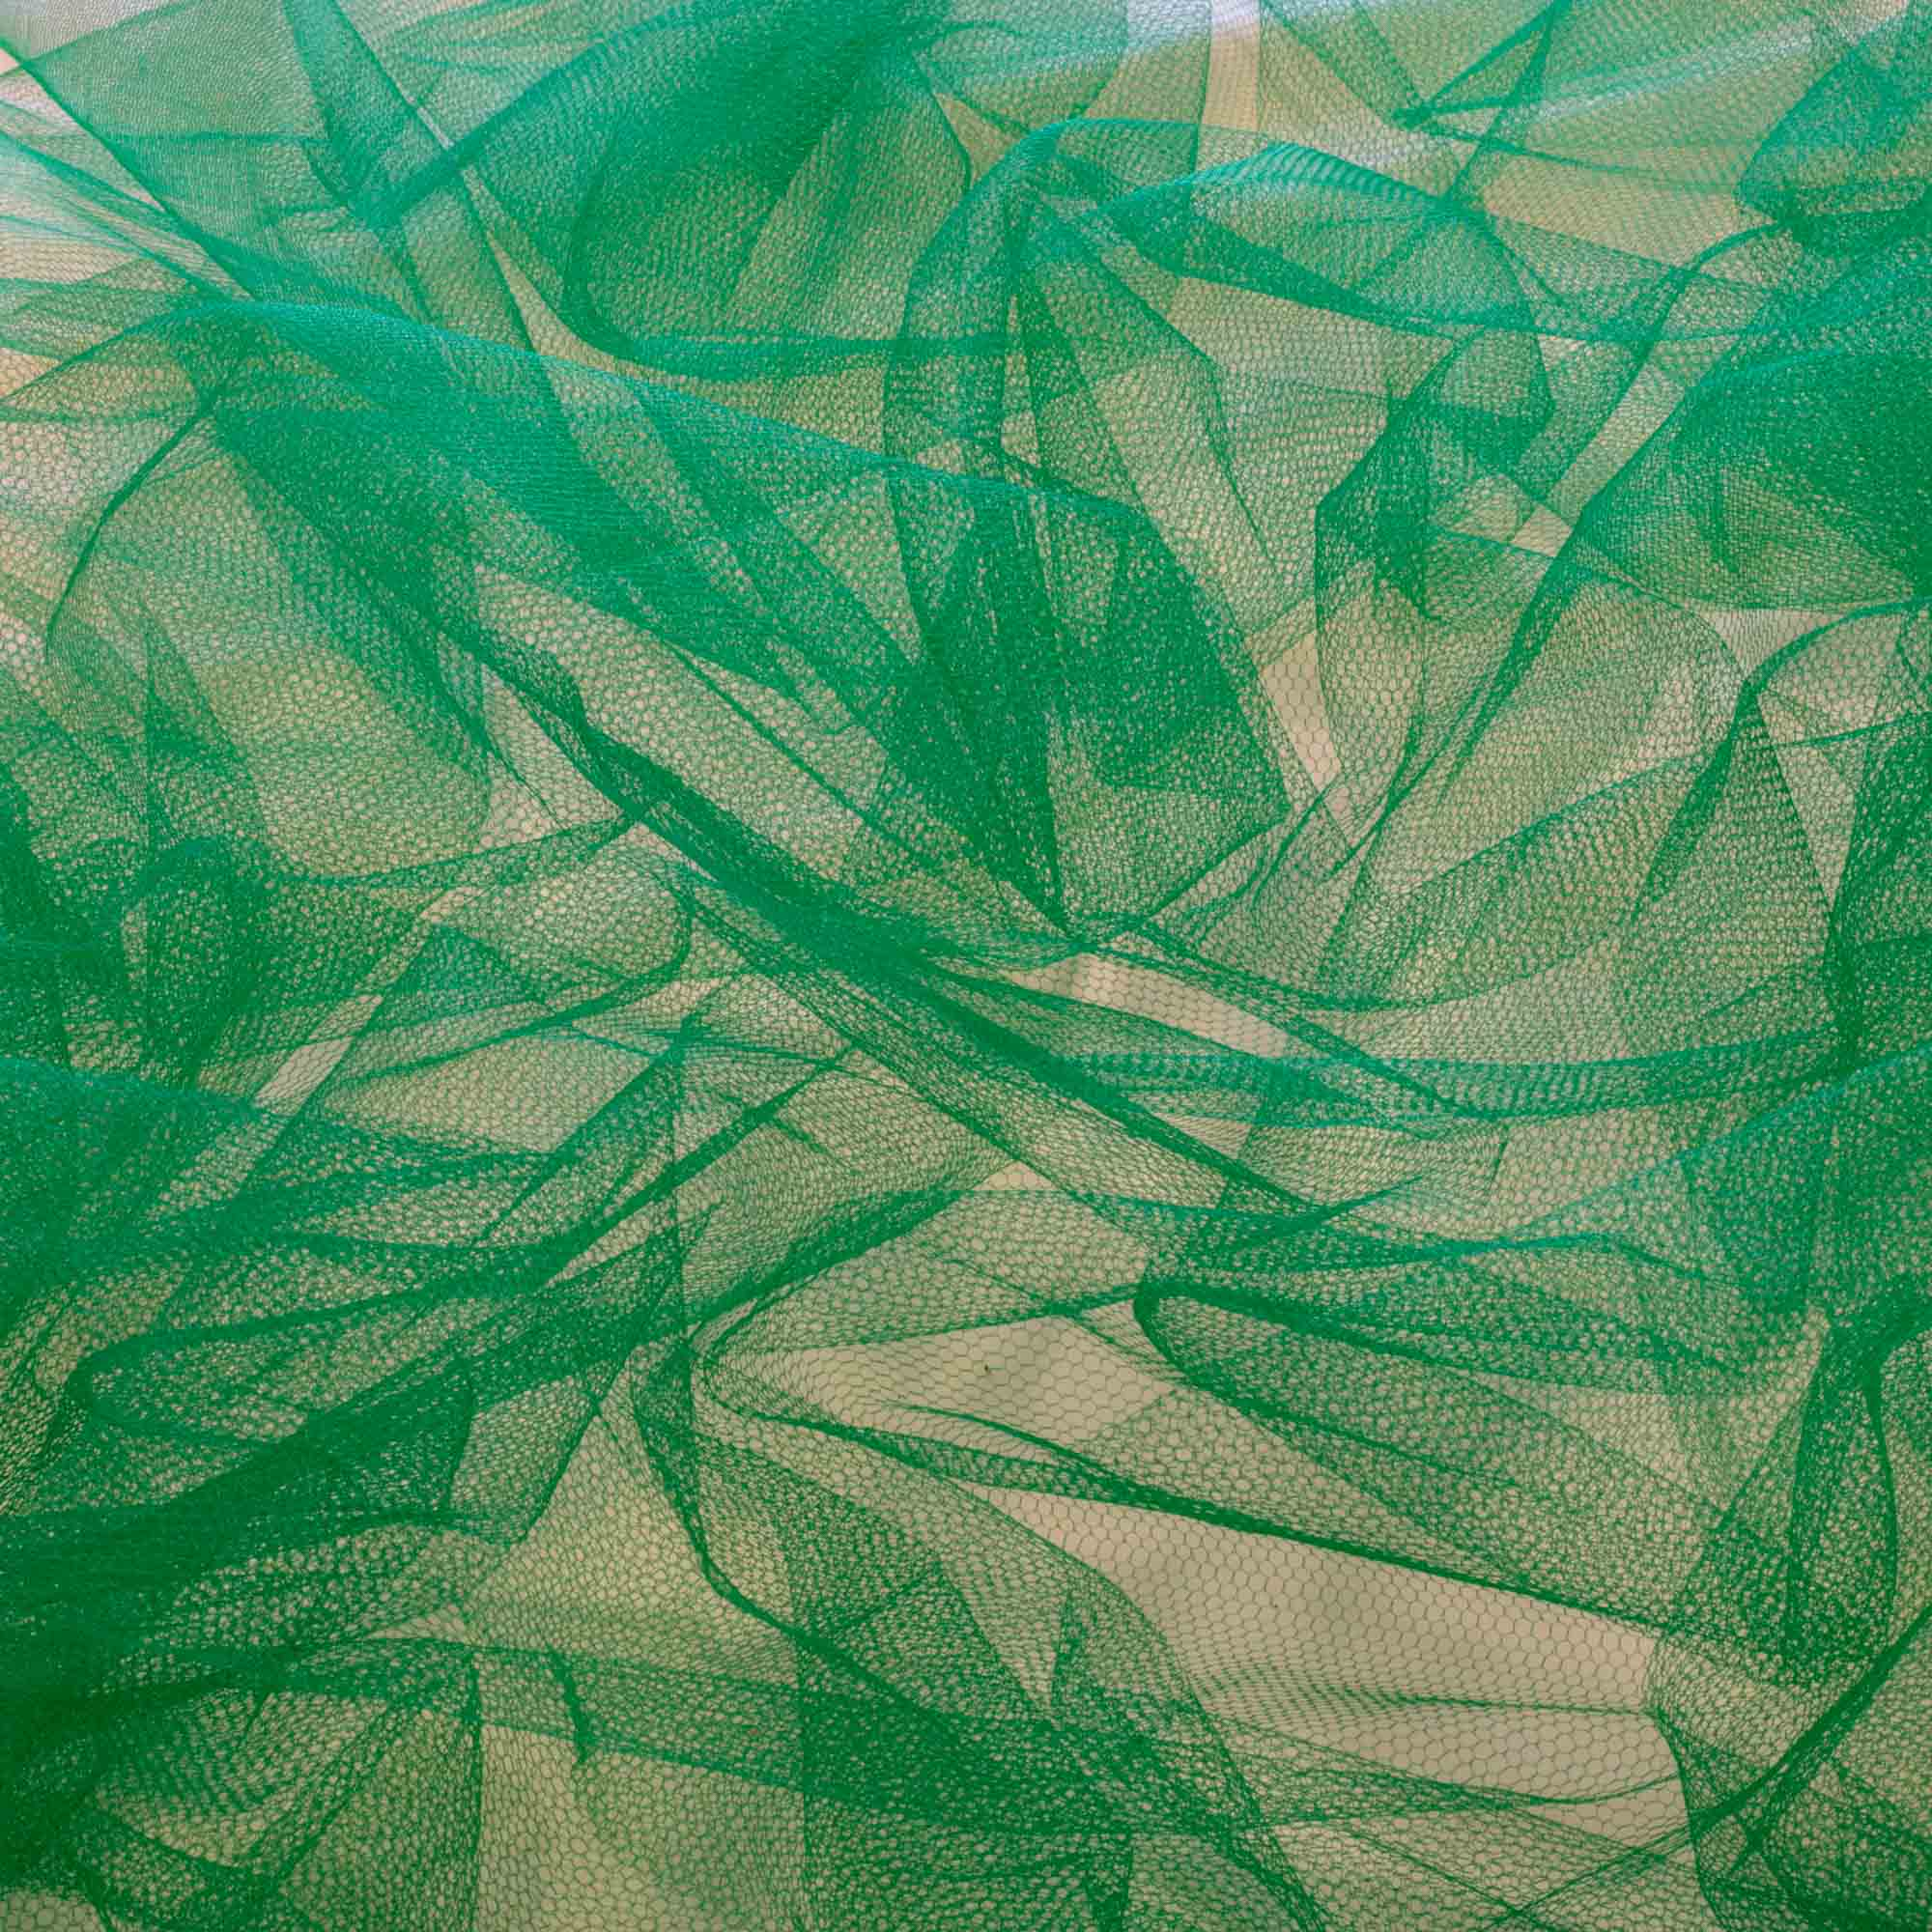 Tecido Tule Verde Bandeira 100% Poliester 1,20 m Largura